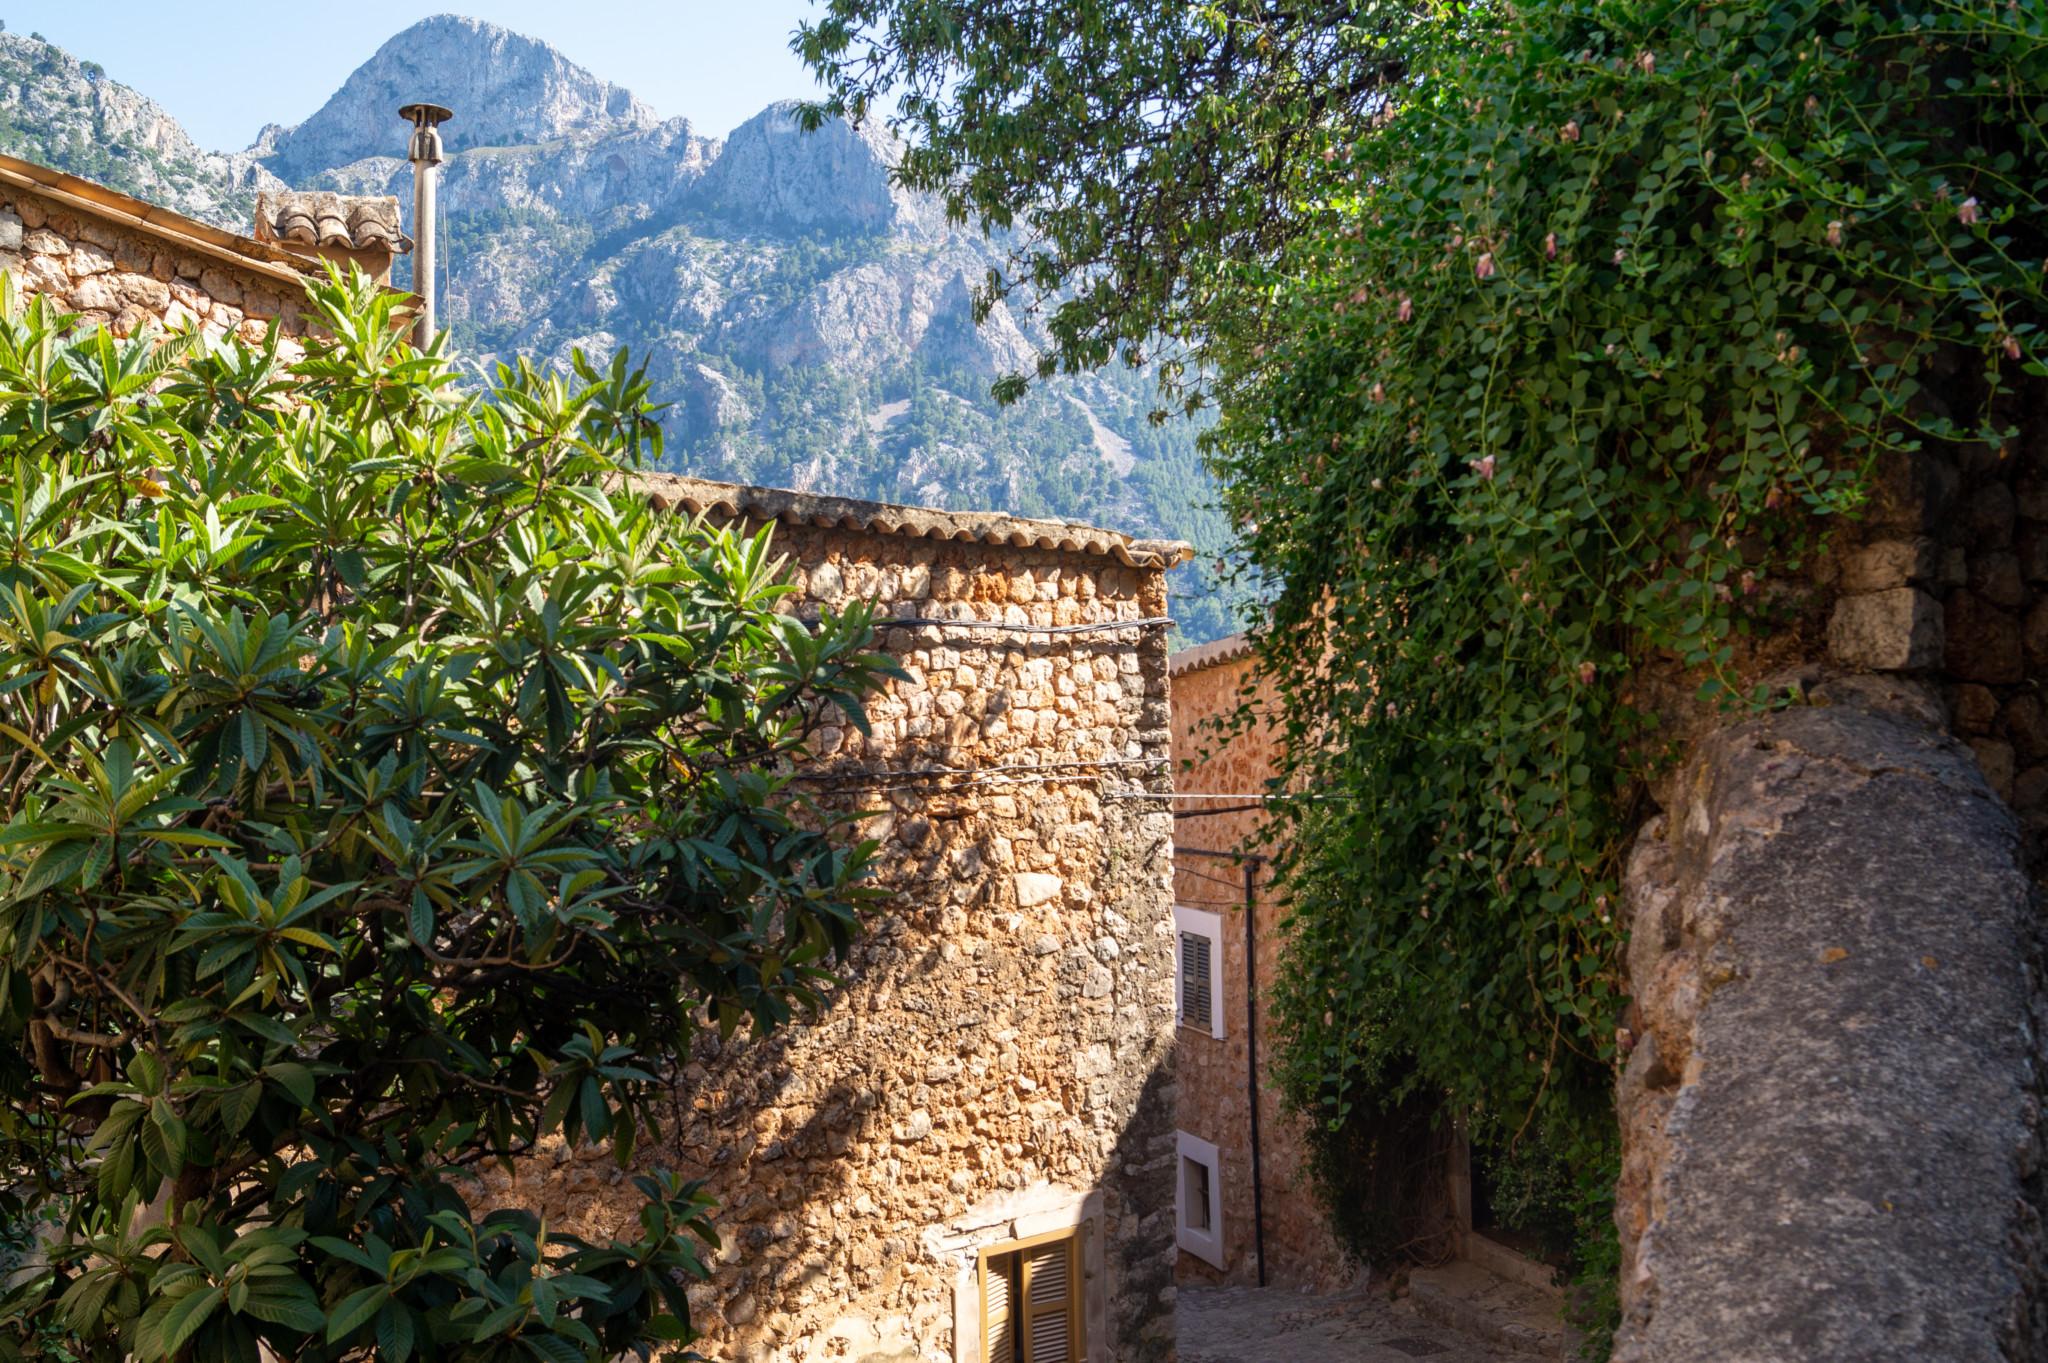 Ausblick auf die Serra de Tramuntana